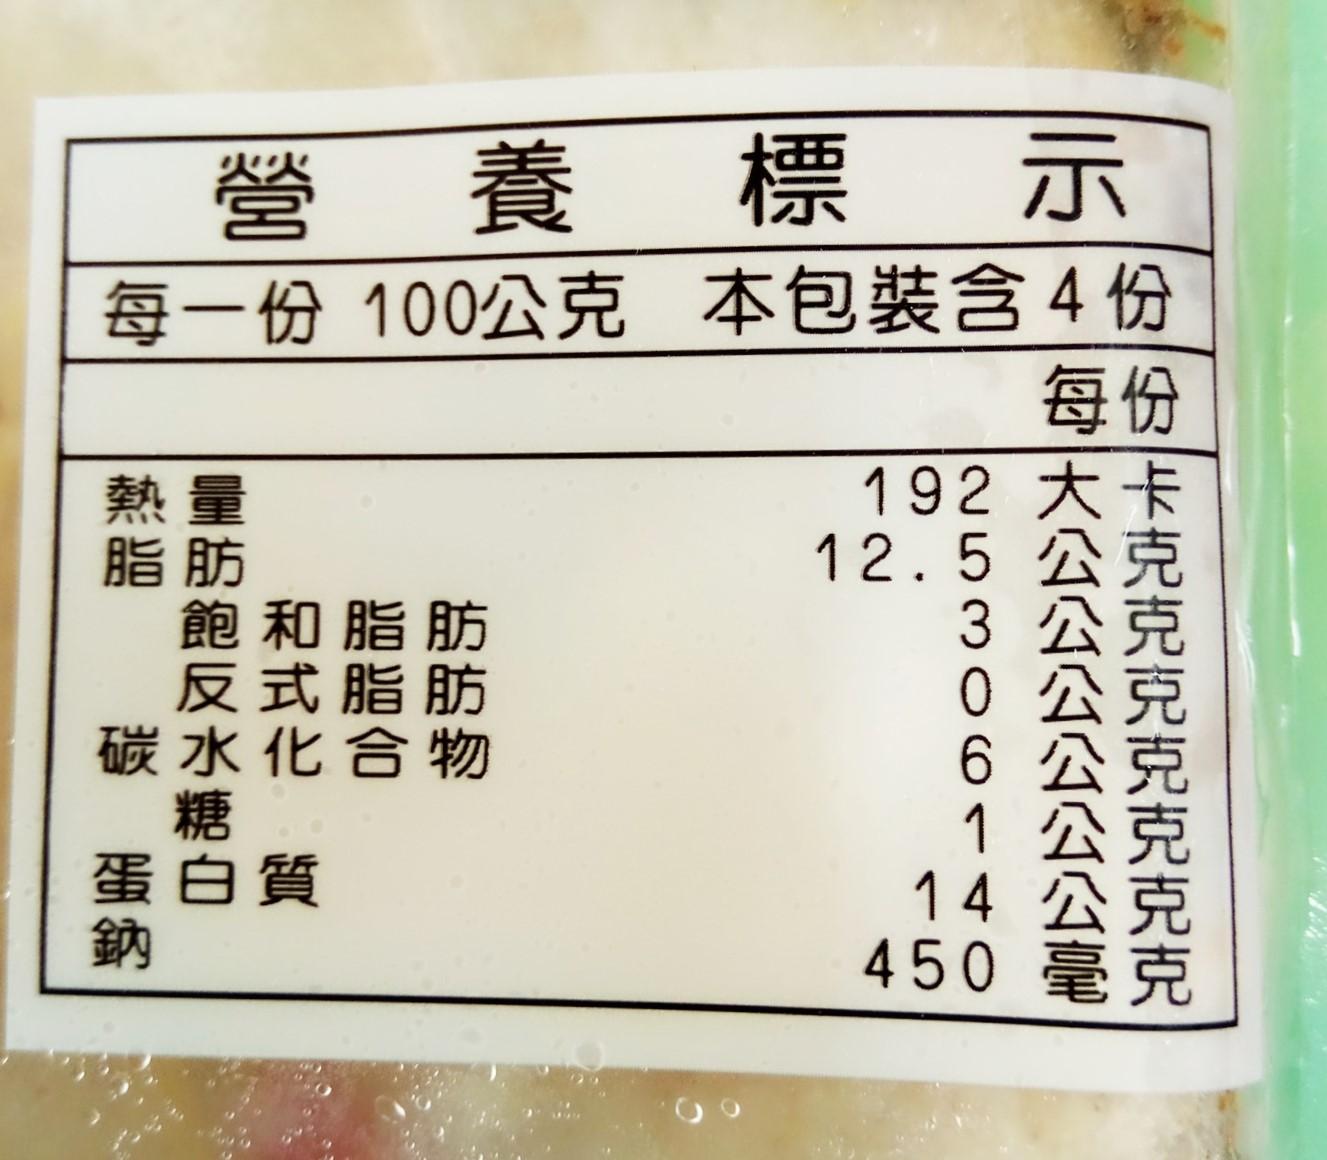 Image Steamed Cod Fish 机能-清蒸鳕鱼 400grams